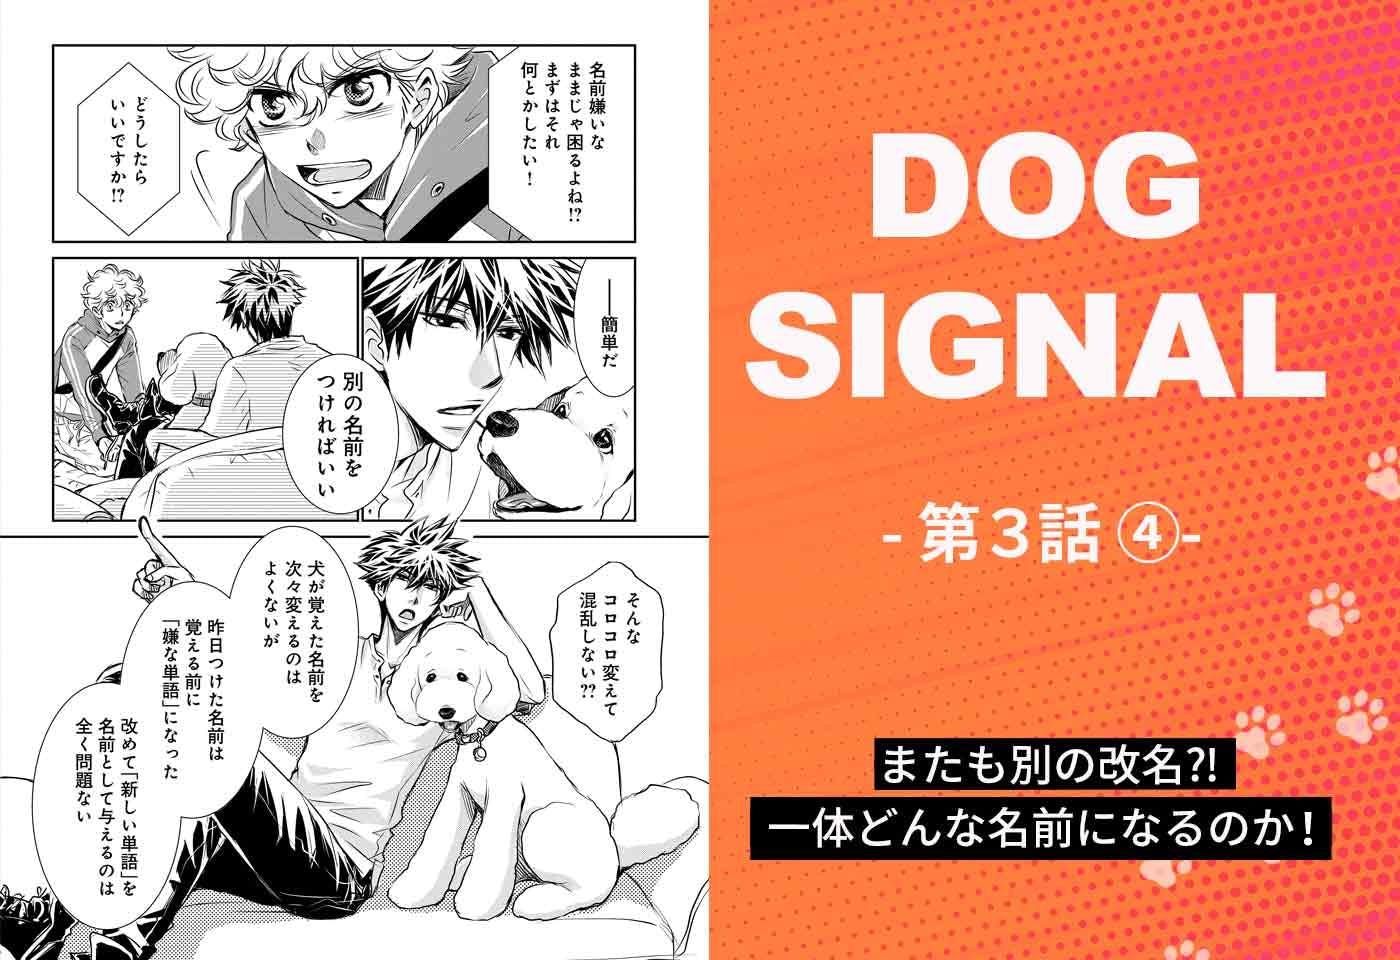 『DOG SIGNAL』3話目 4/4